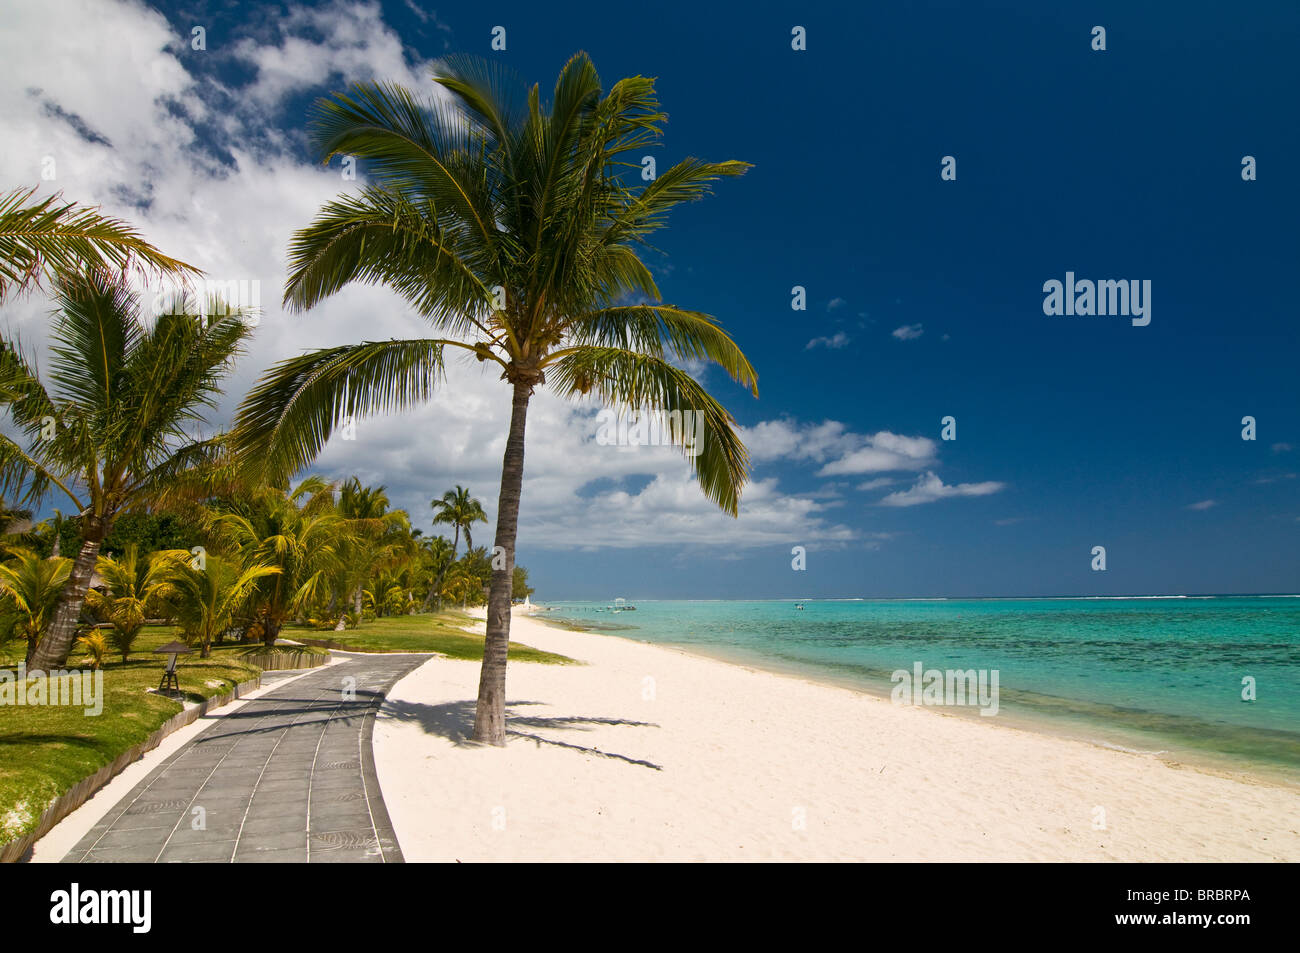 The beach of the Beachcomber Dinarobin six star hotel, Mauritius, Indian Ocean - Stock Image